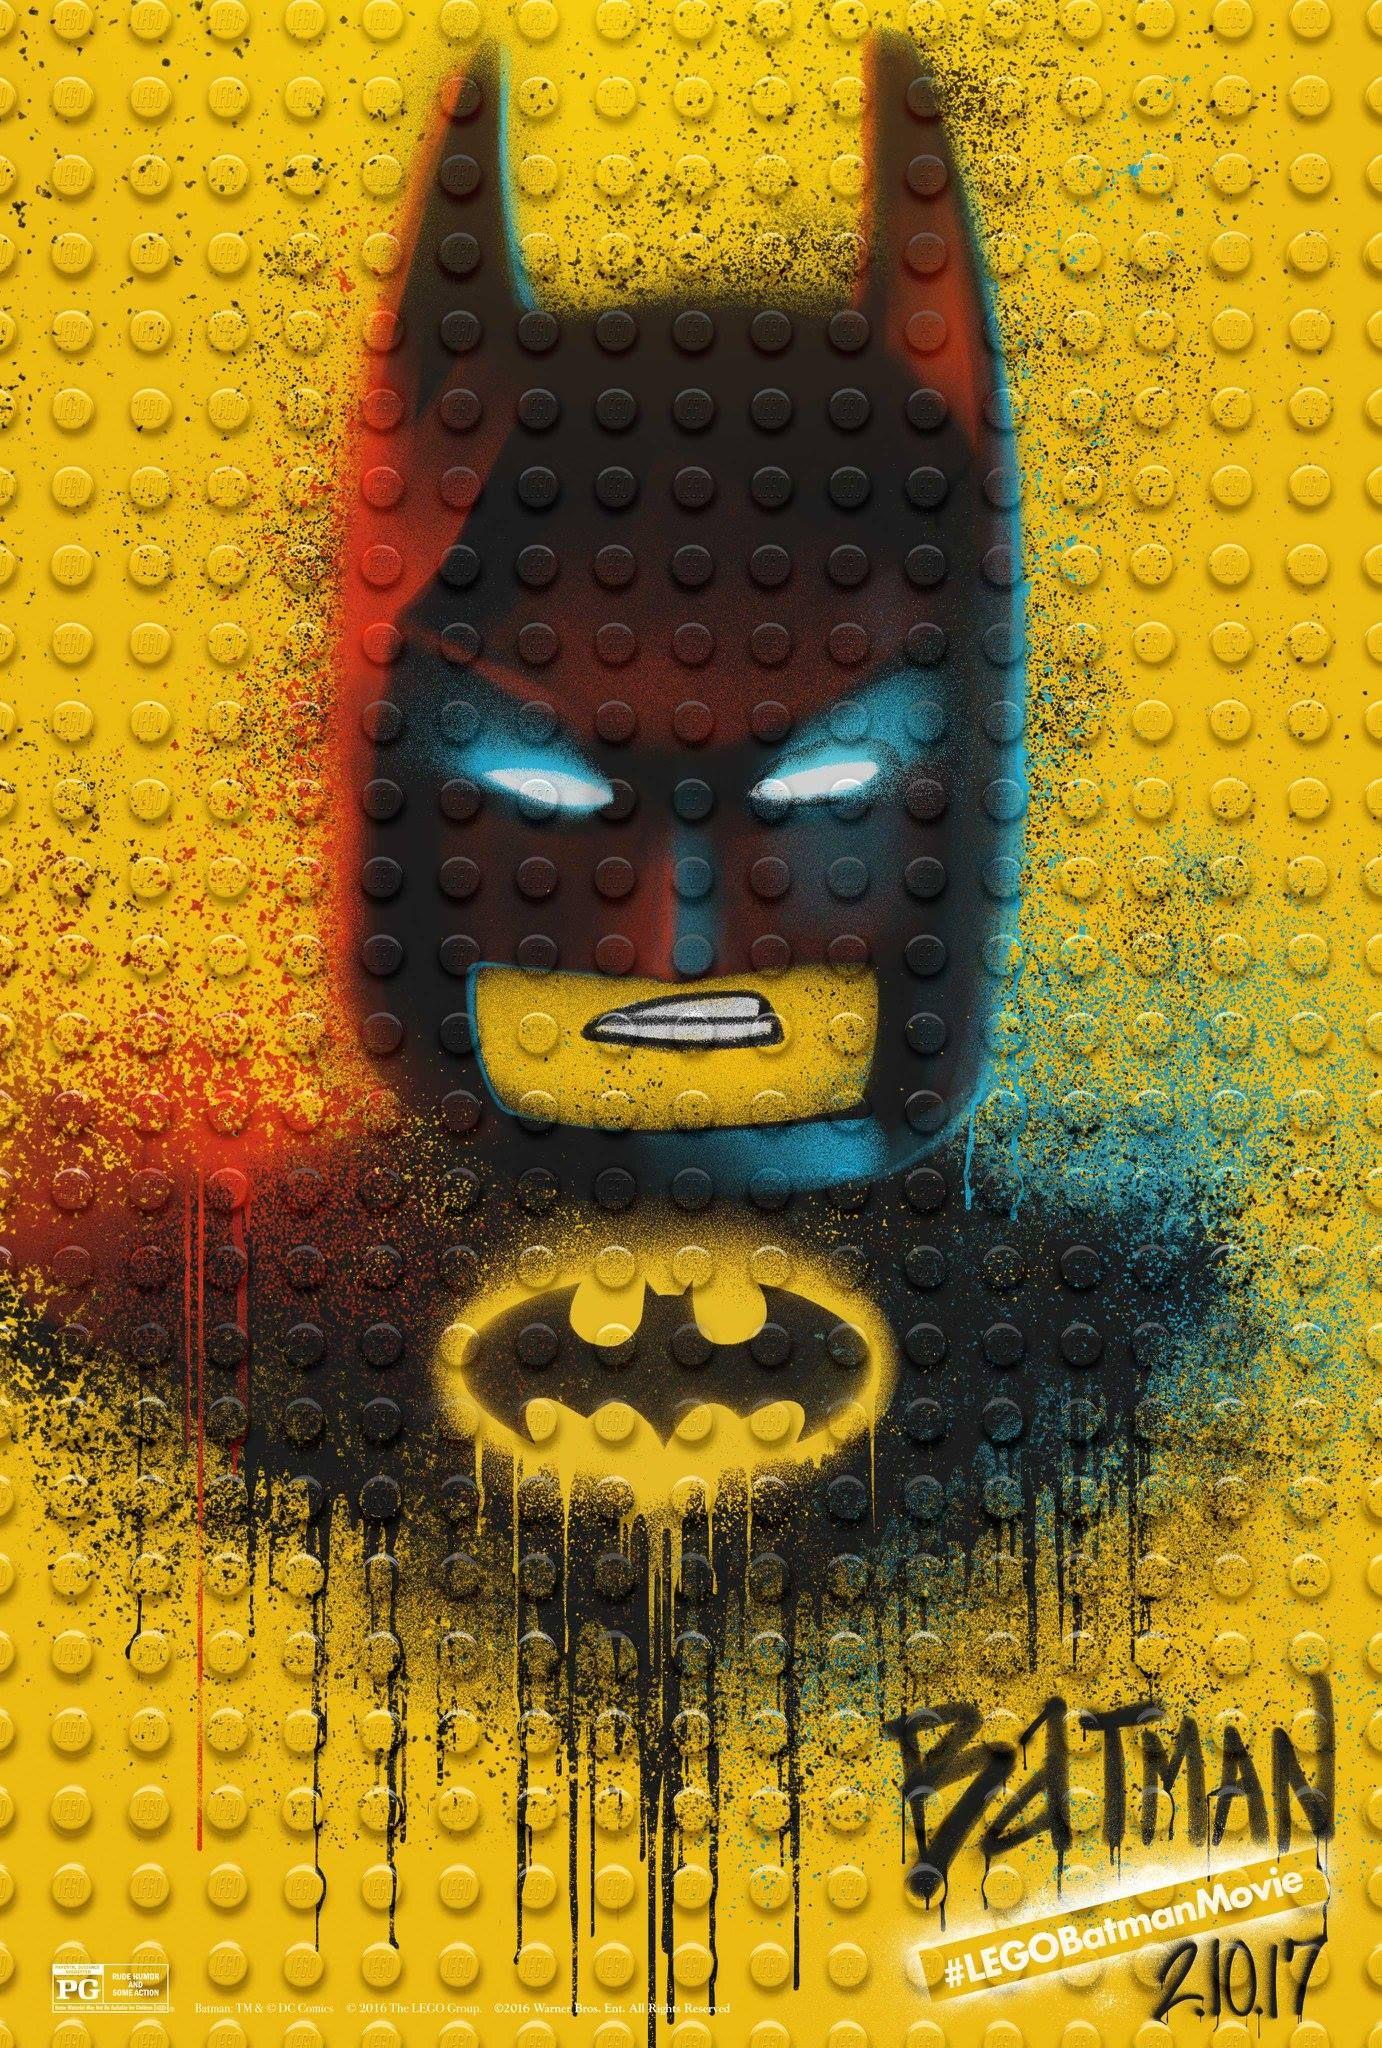 Batman Villains In Lego Batman Movie Character Posters